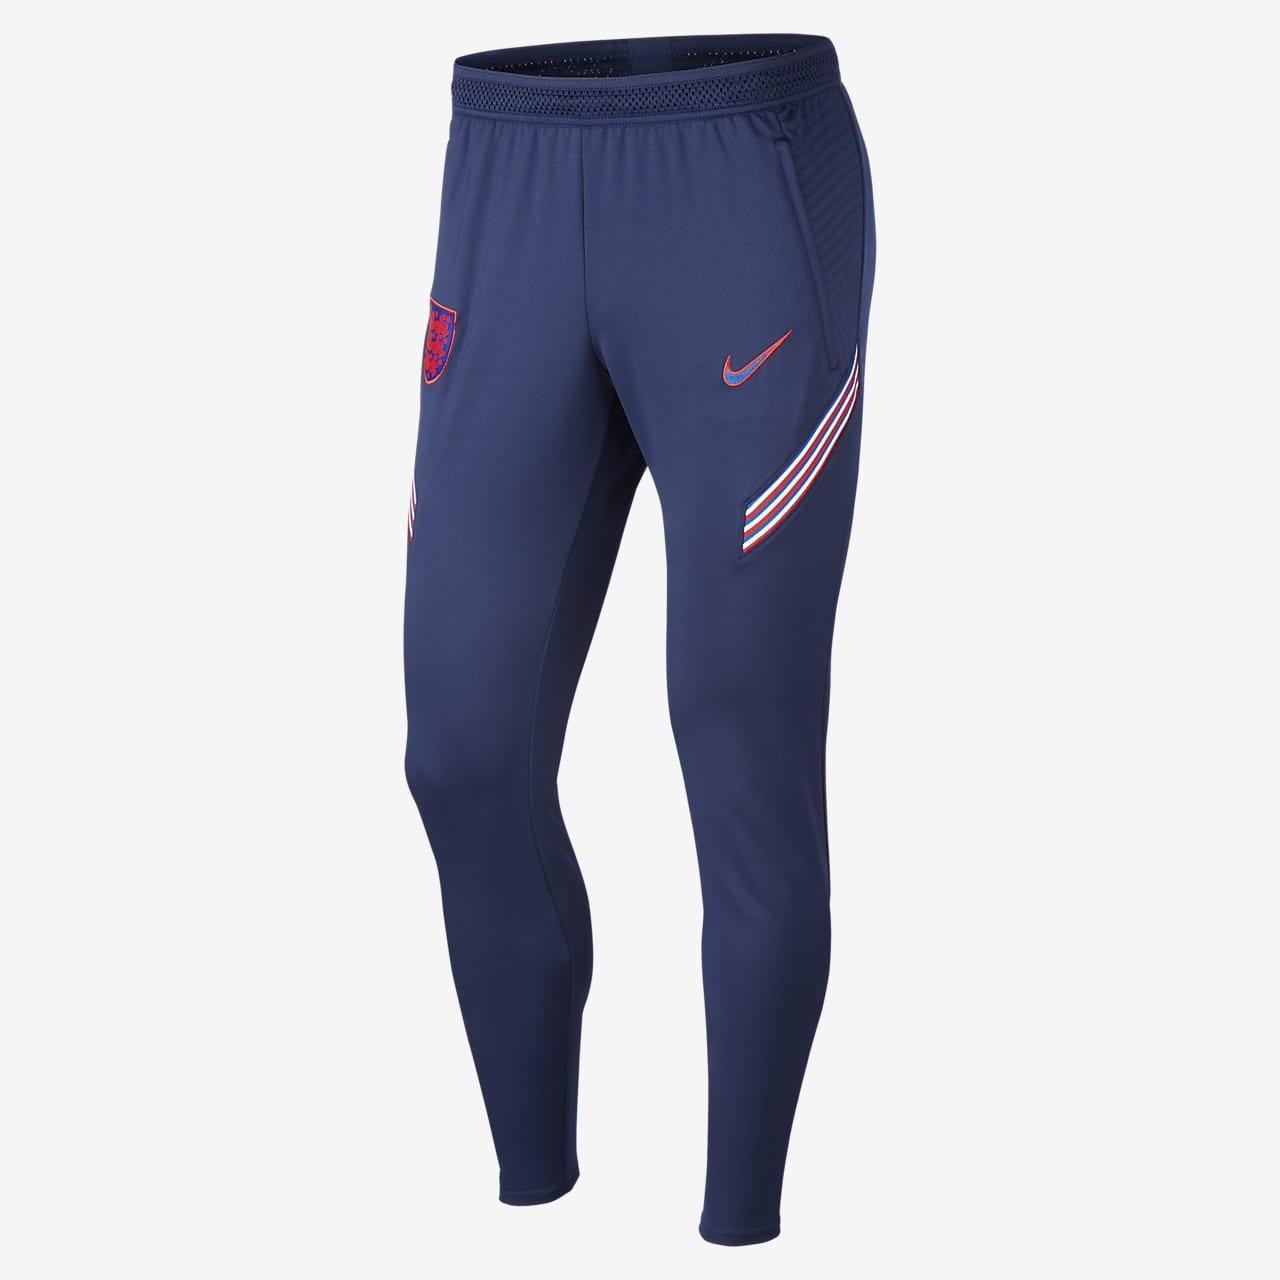 Pantaloni da calcio Inghilterra Strike - Uomo